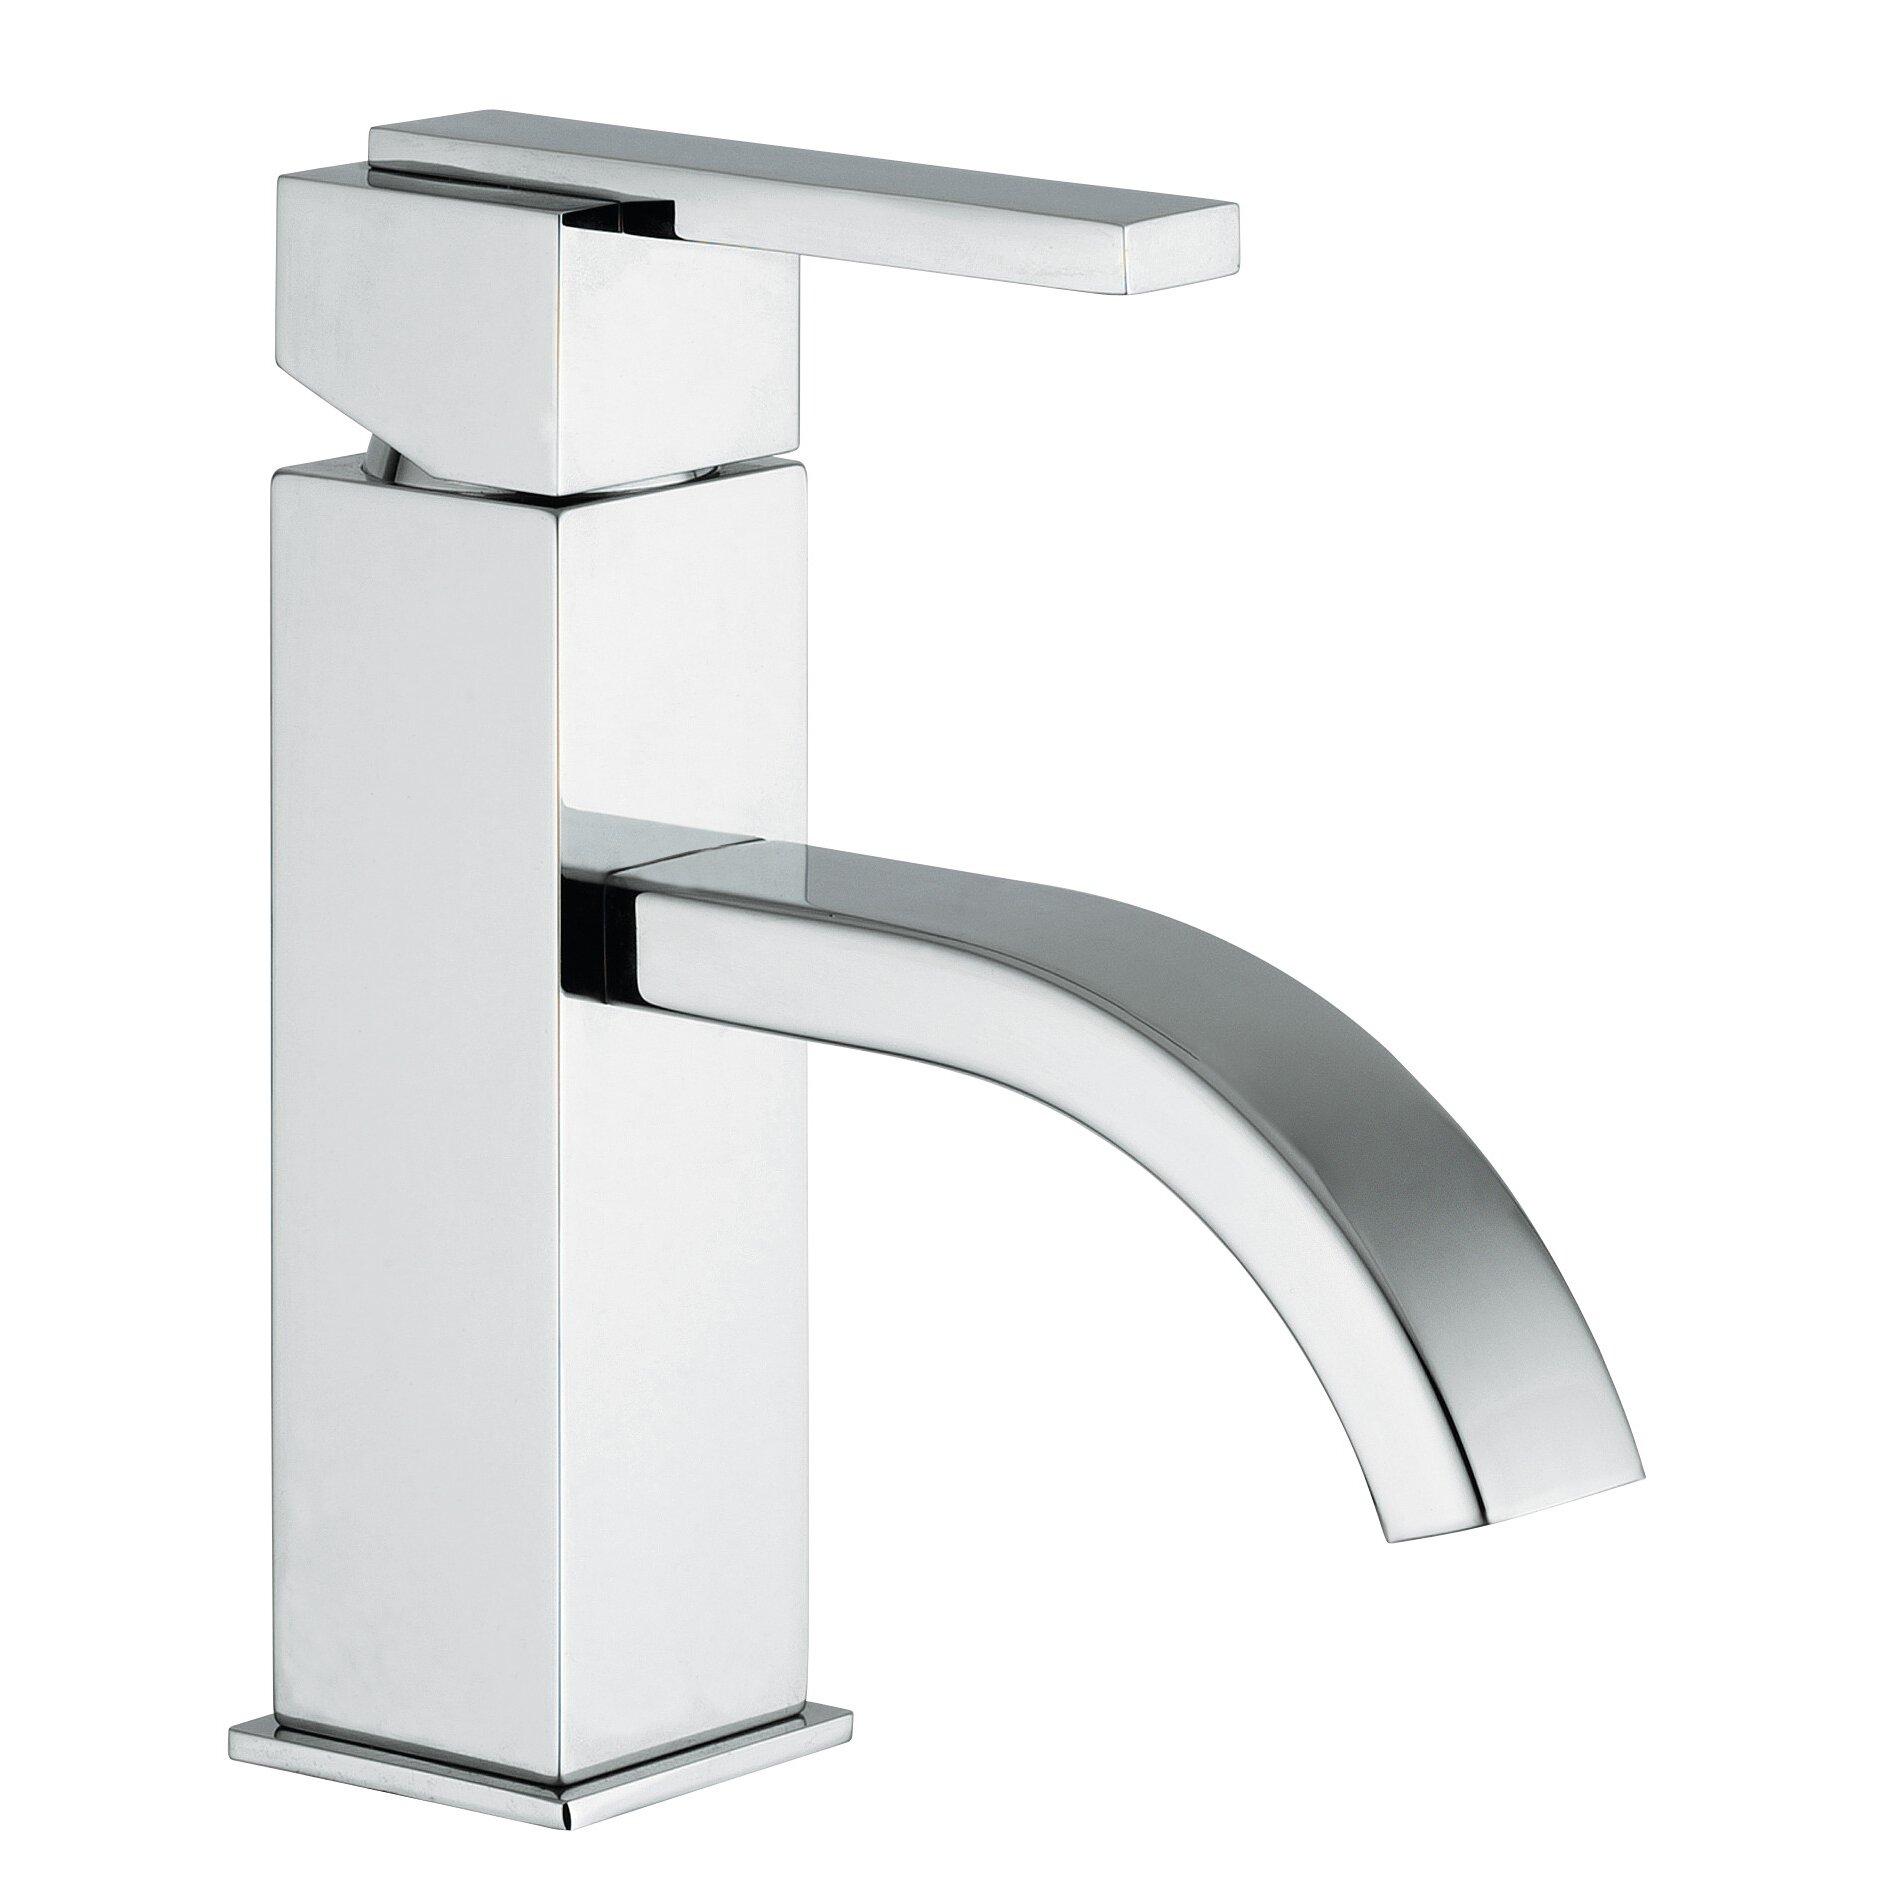 Jewel Faucets J15 Bath Series Single Lever Handle Bathroom Faucet with ...